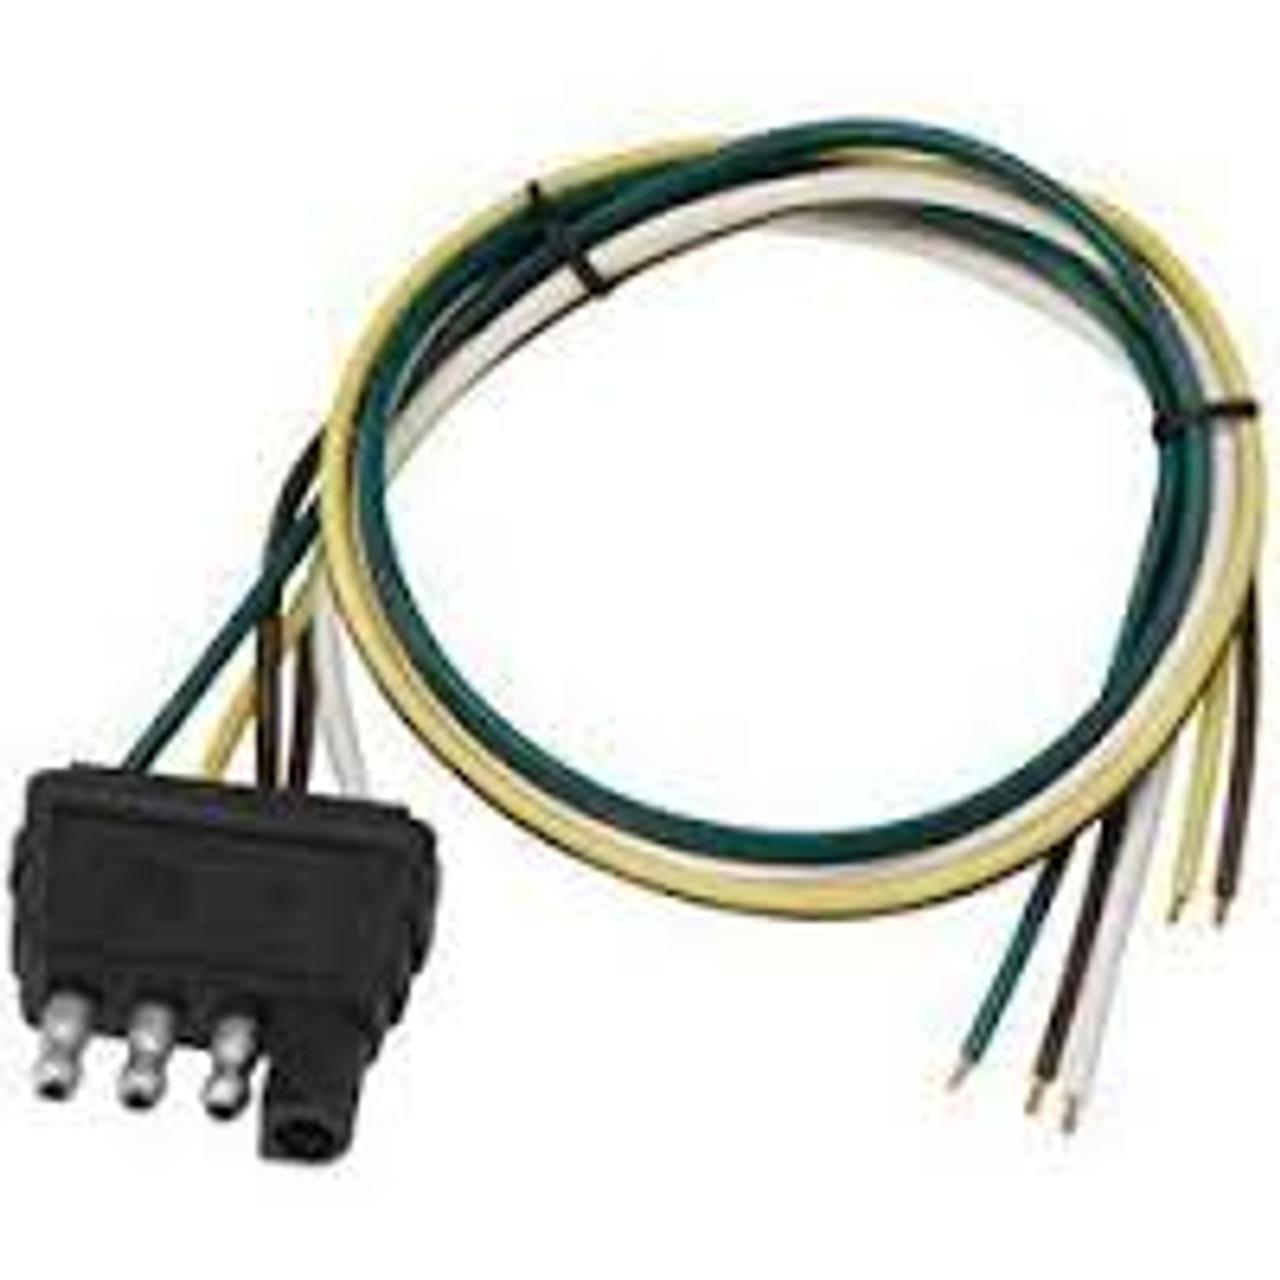 7' Main Wire Harness